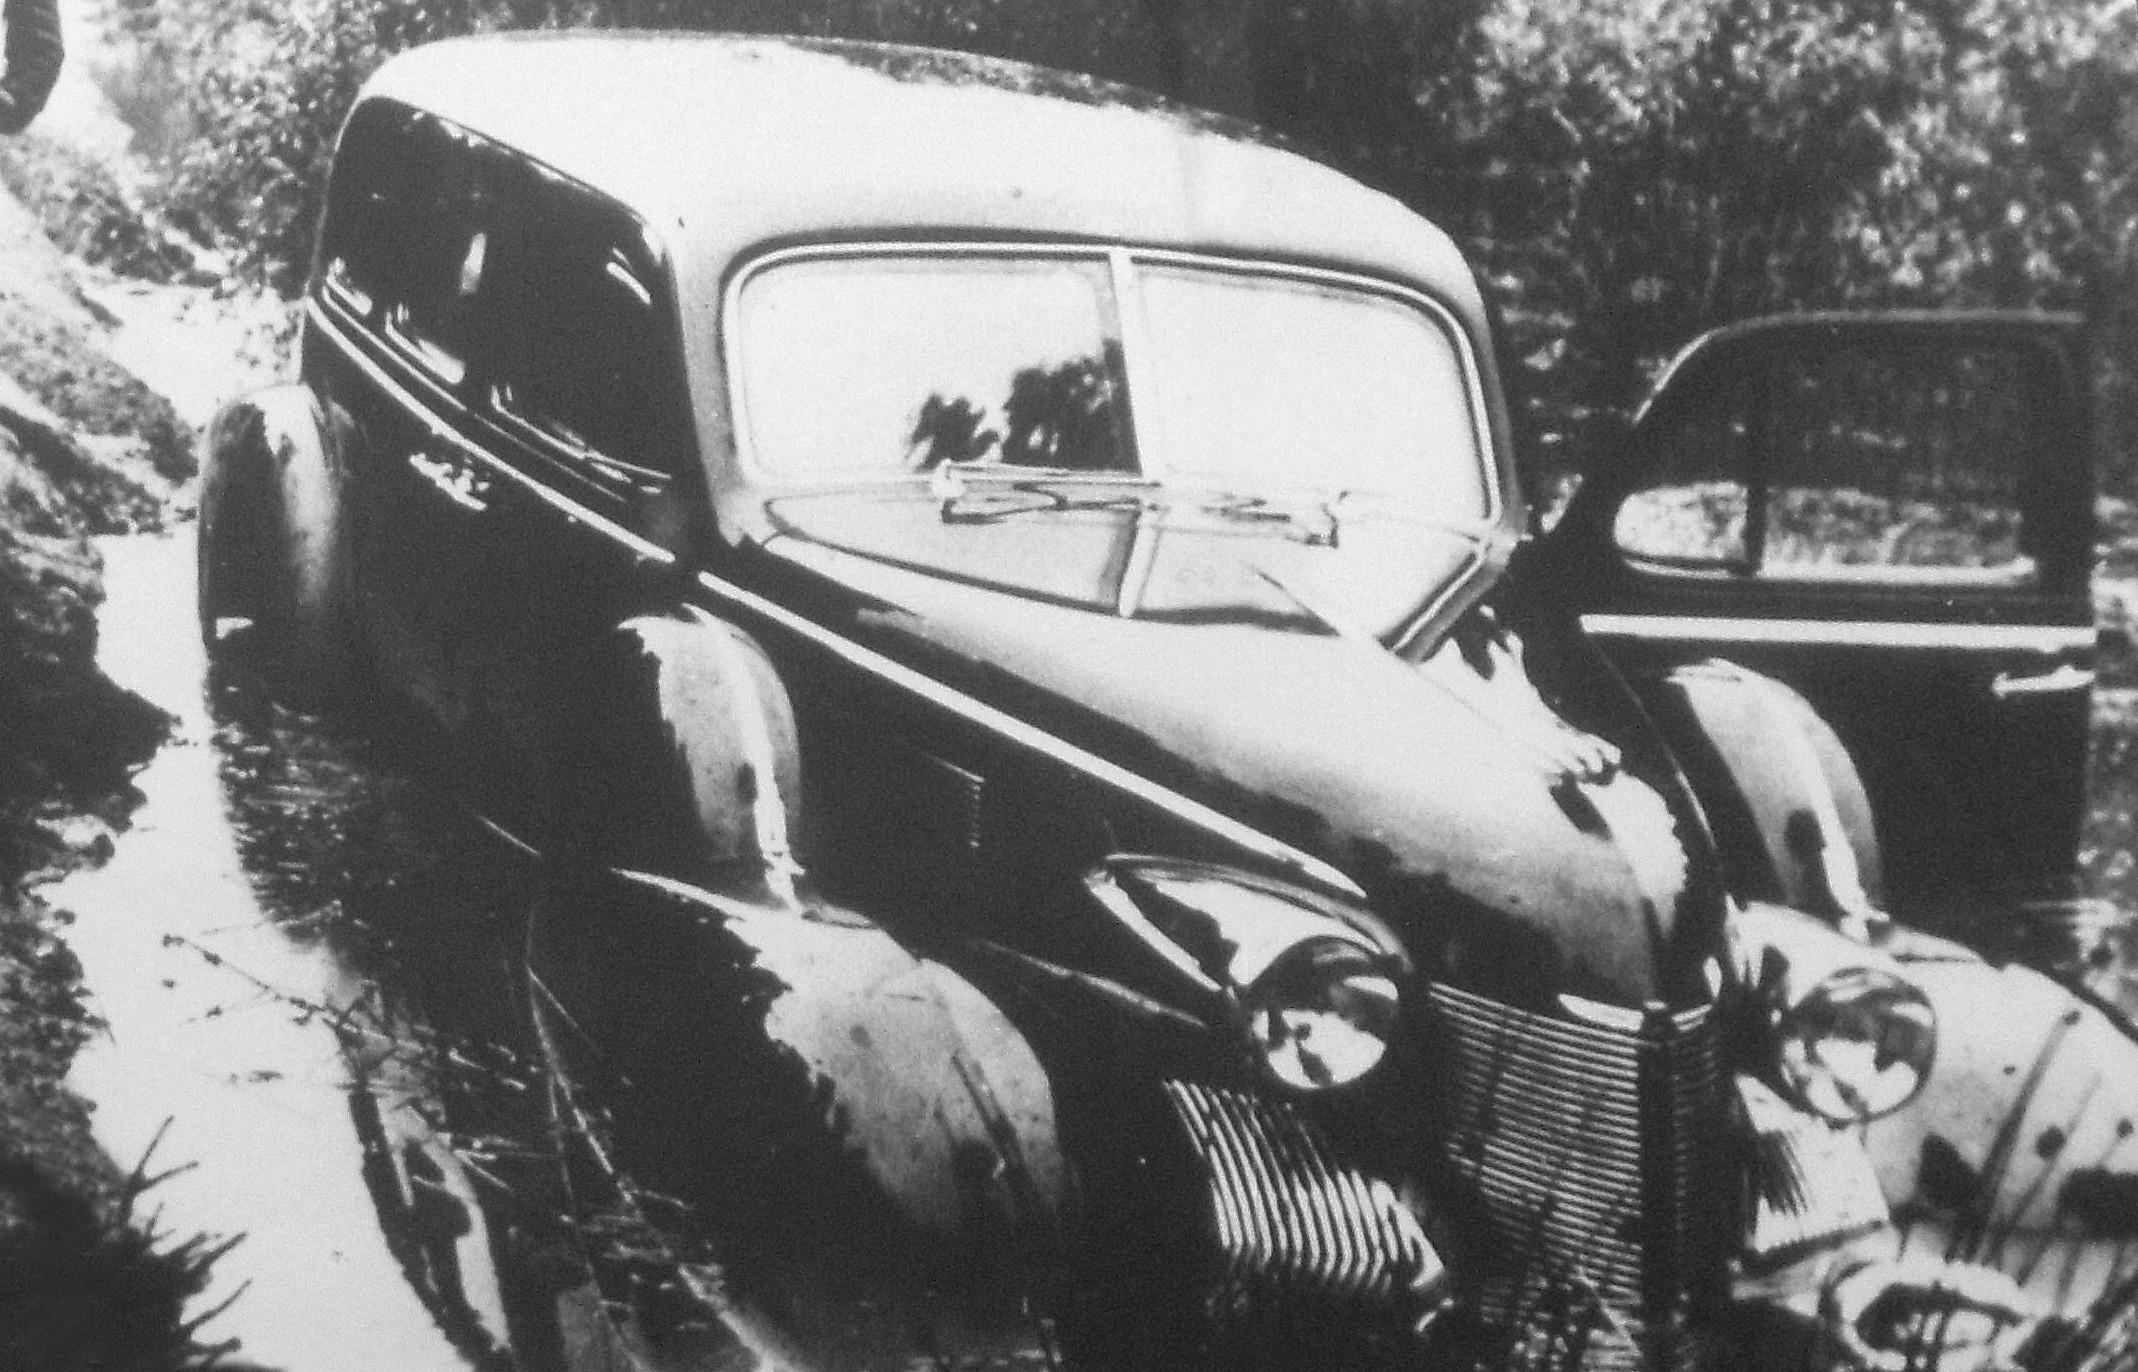 File Kungens Kurva Kungens Bil I Dike 1946 Jpg Wikimedia Commons